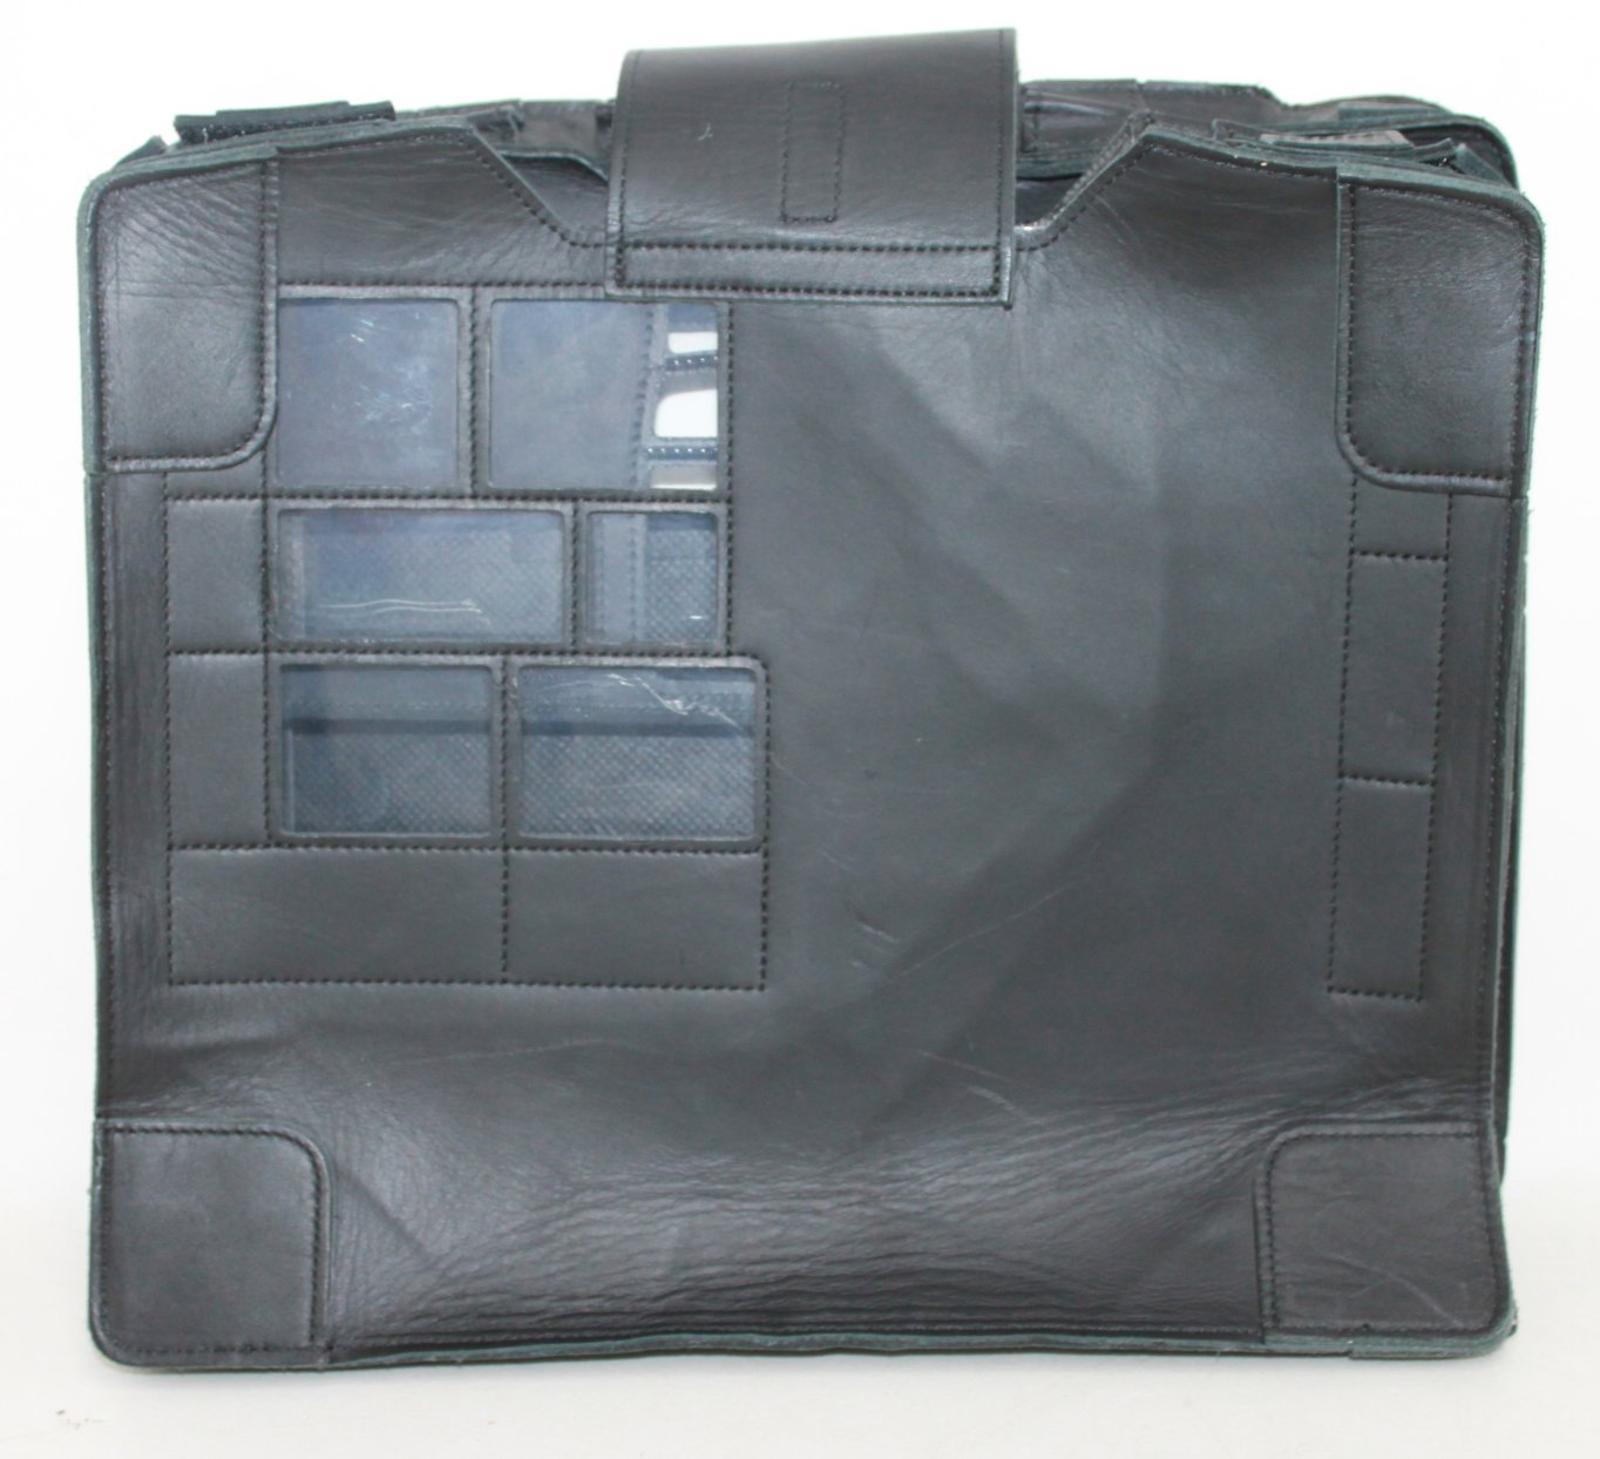 Ny Laptop 19 Cf Toughbook VNB1901 Panasonic til Lærveske Syntetisk Cf aqr4xUa